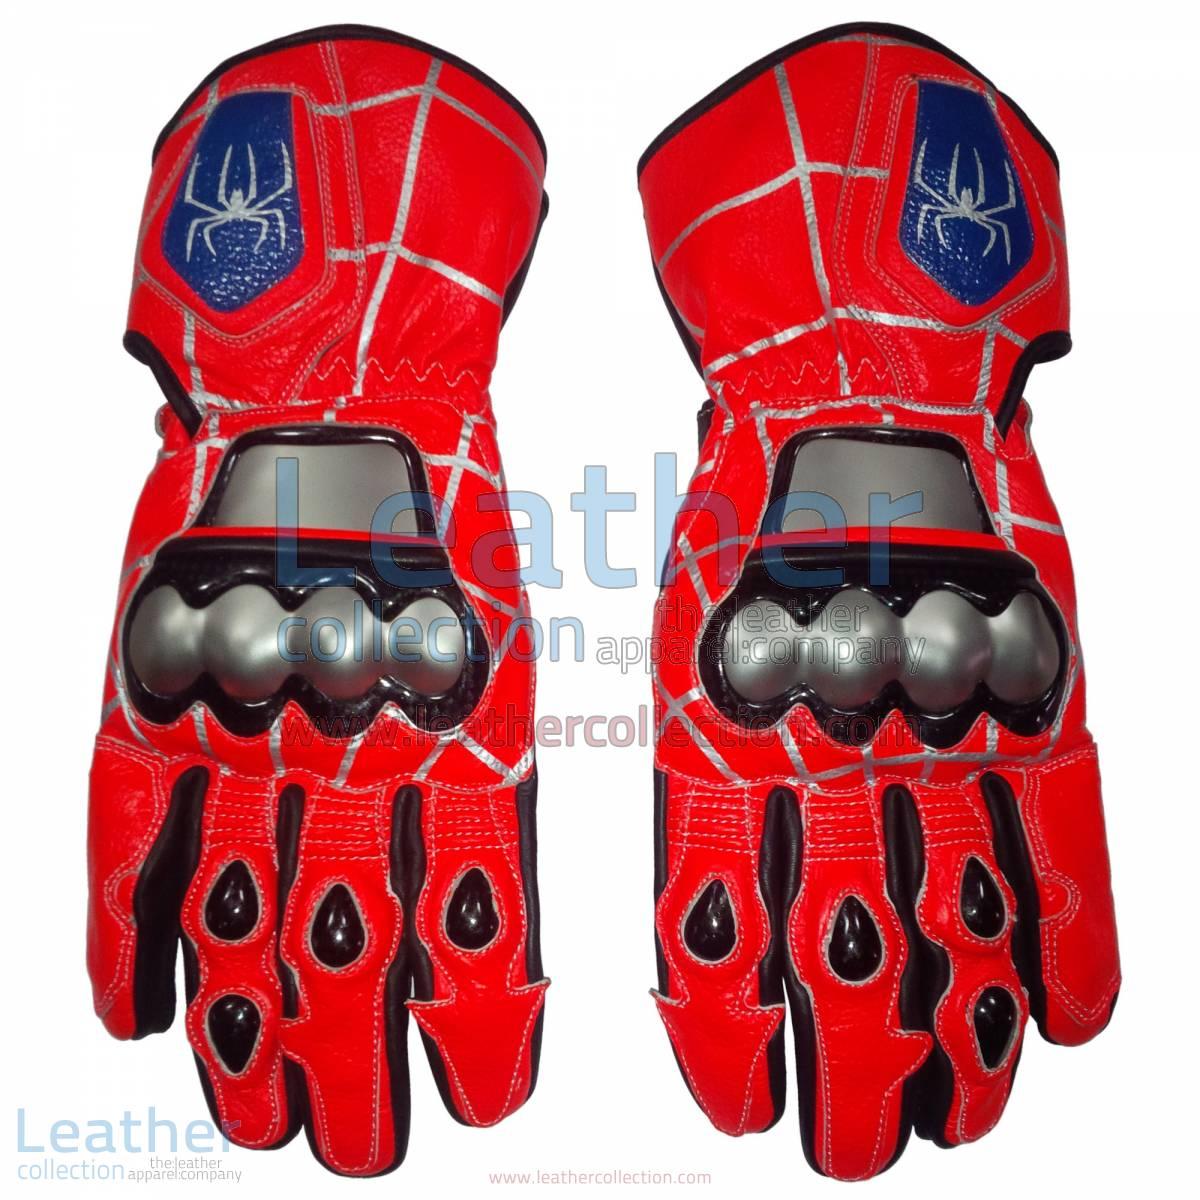 Spiderman Leather Motorbike Race Gloves | Spiderman leather motorcycle race gloves